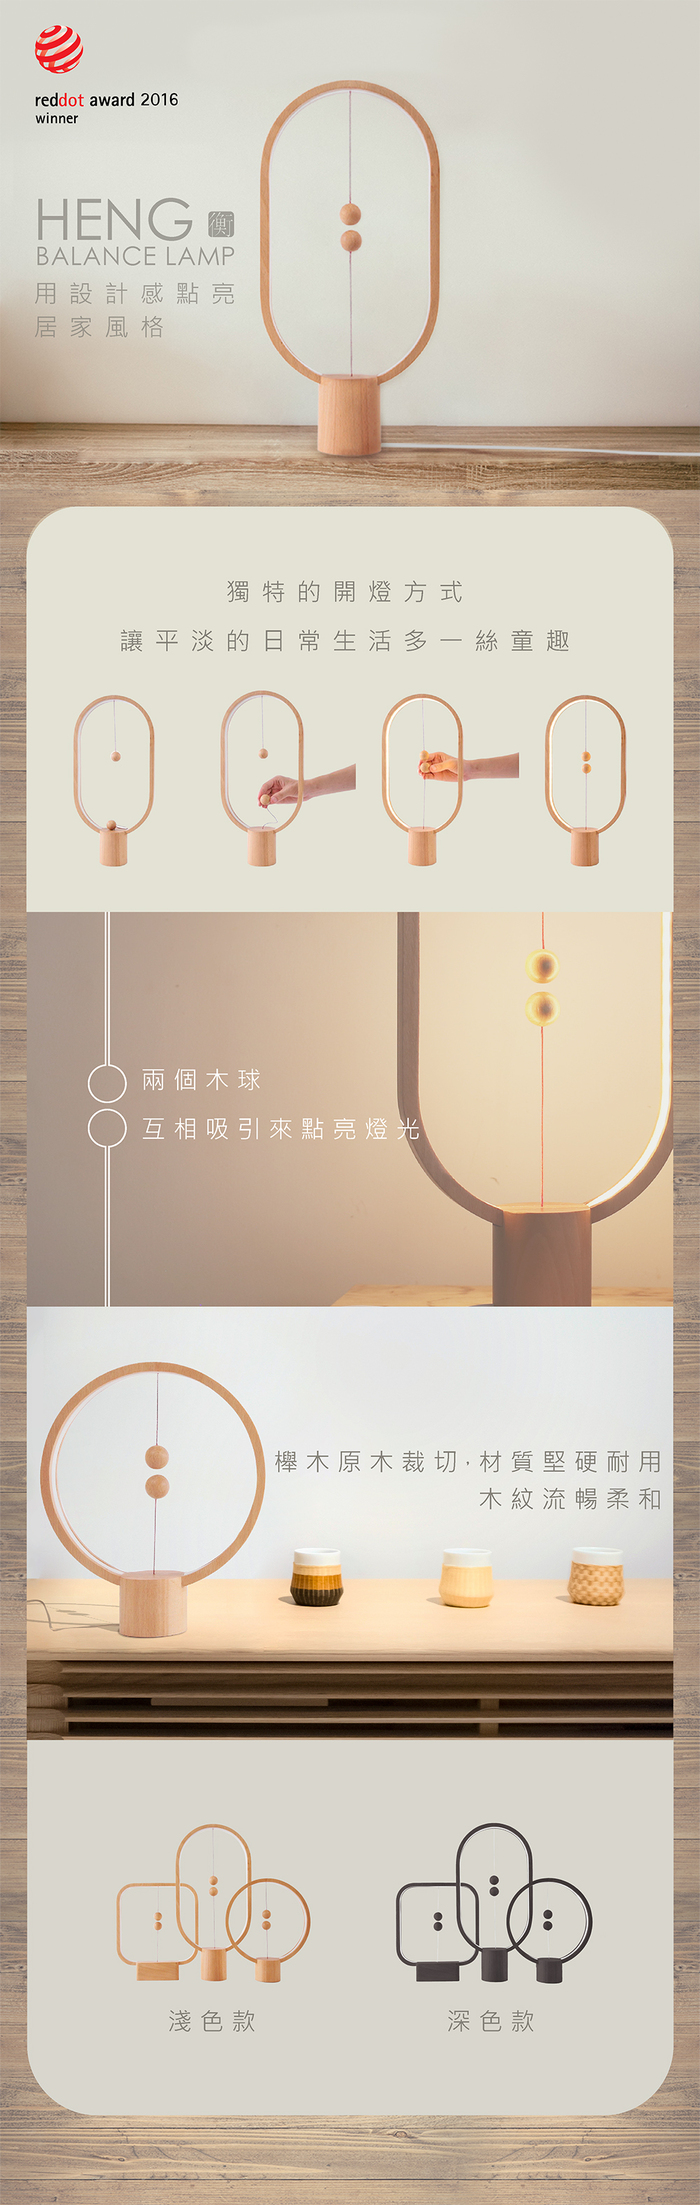 Allocacoc|Heng Balance Lamp 衡 原木燈 - 淺色橢圓型